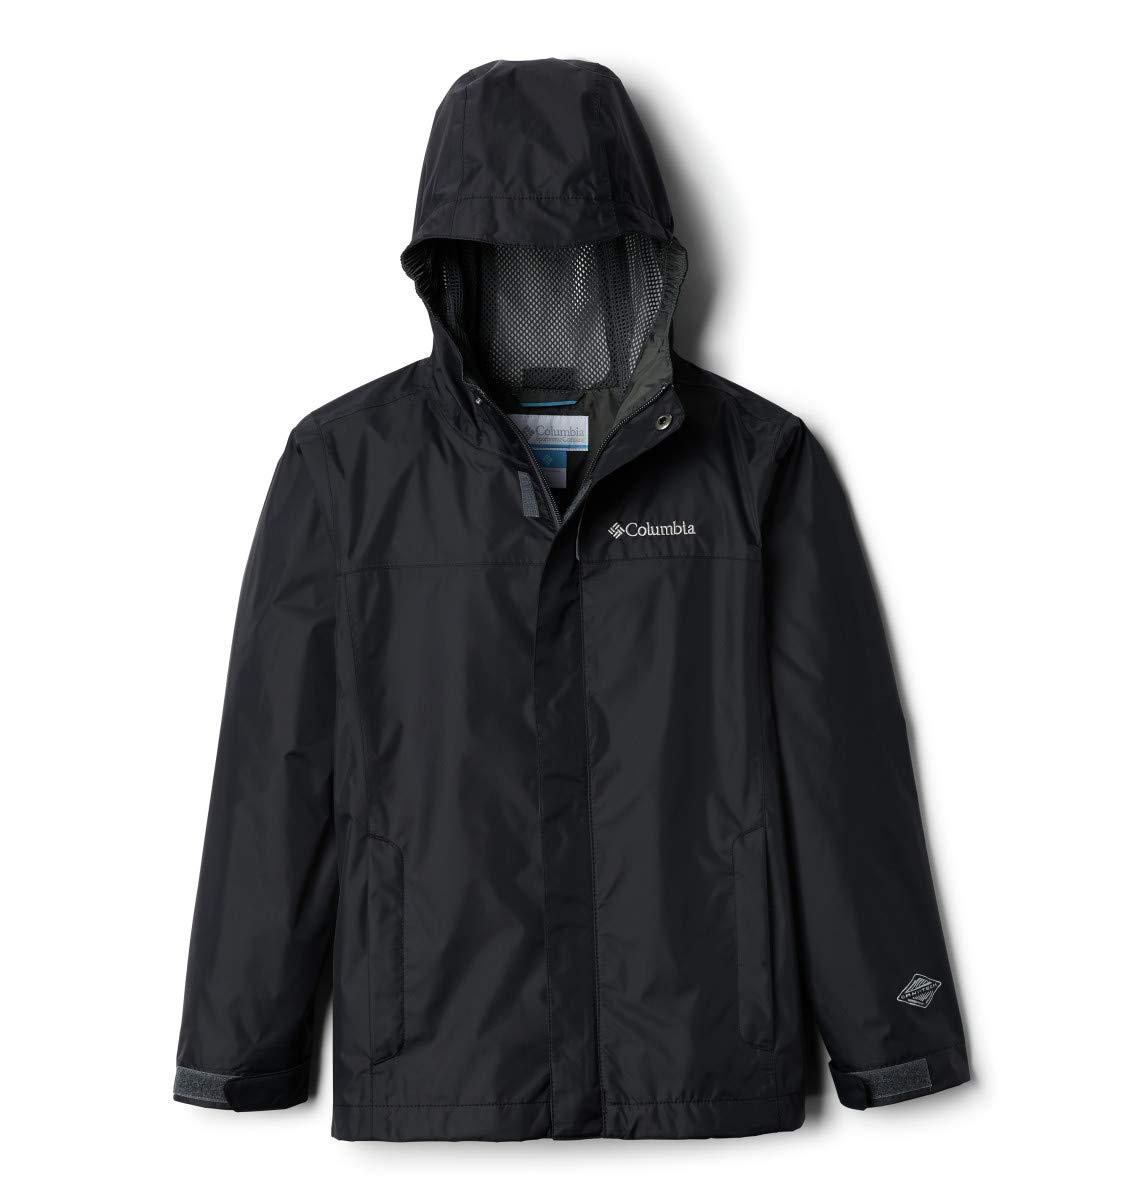 Columbia Watertight Jacket Black Medium